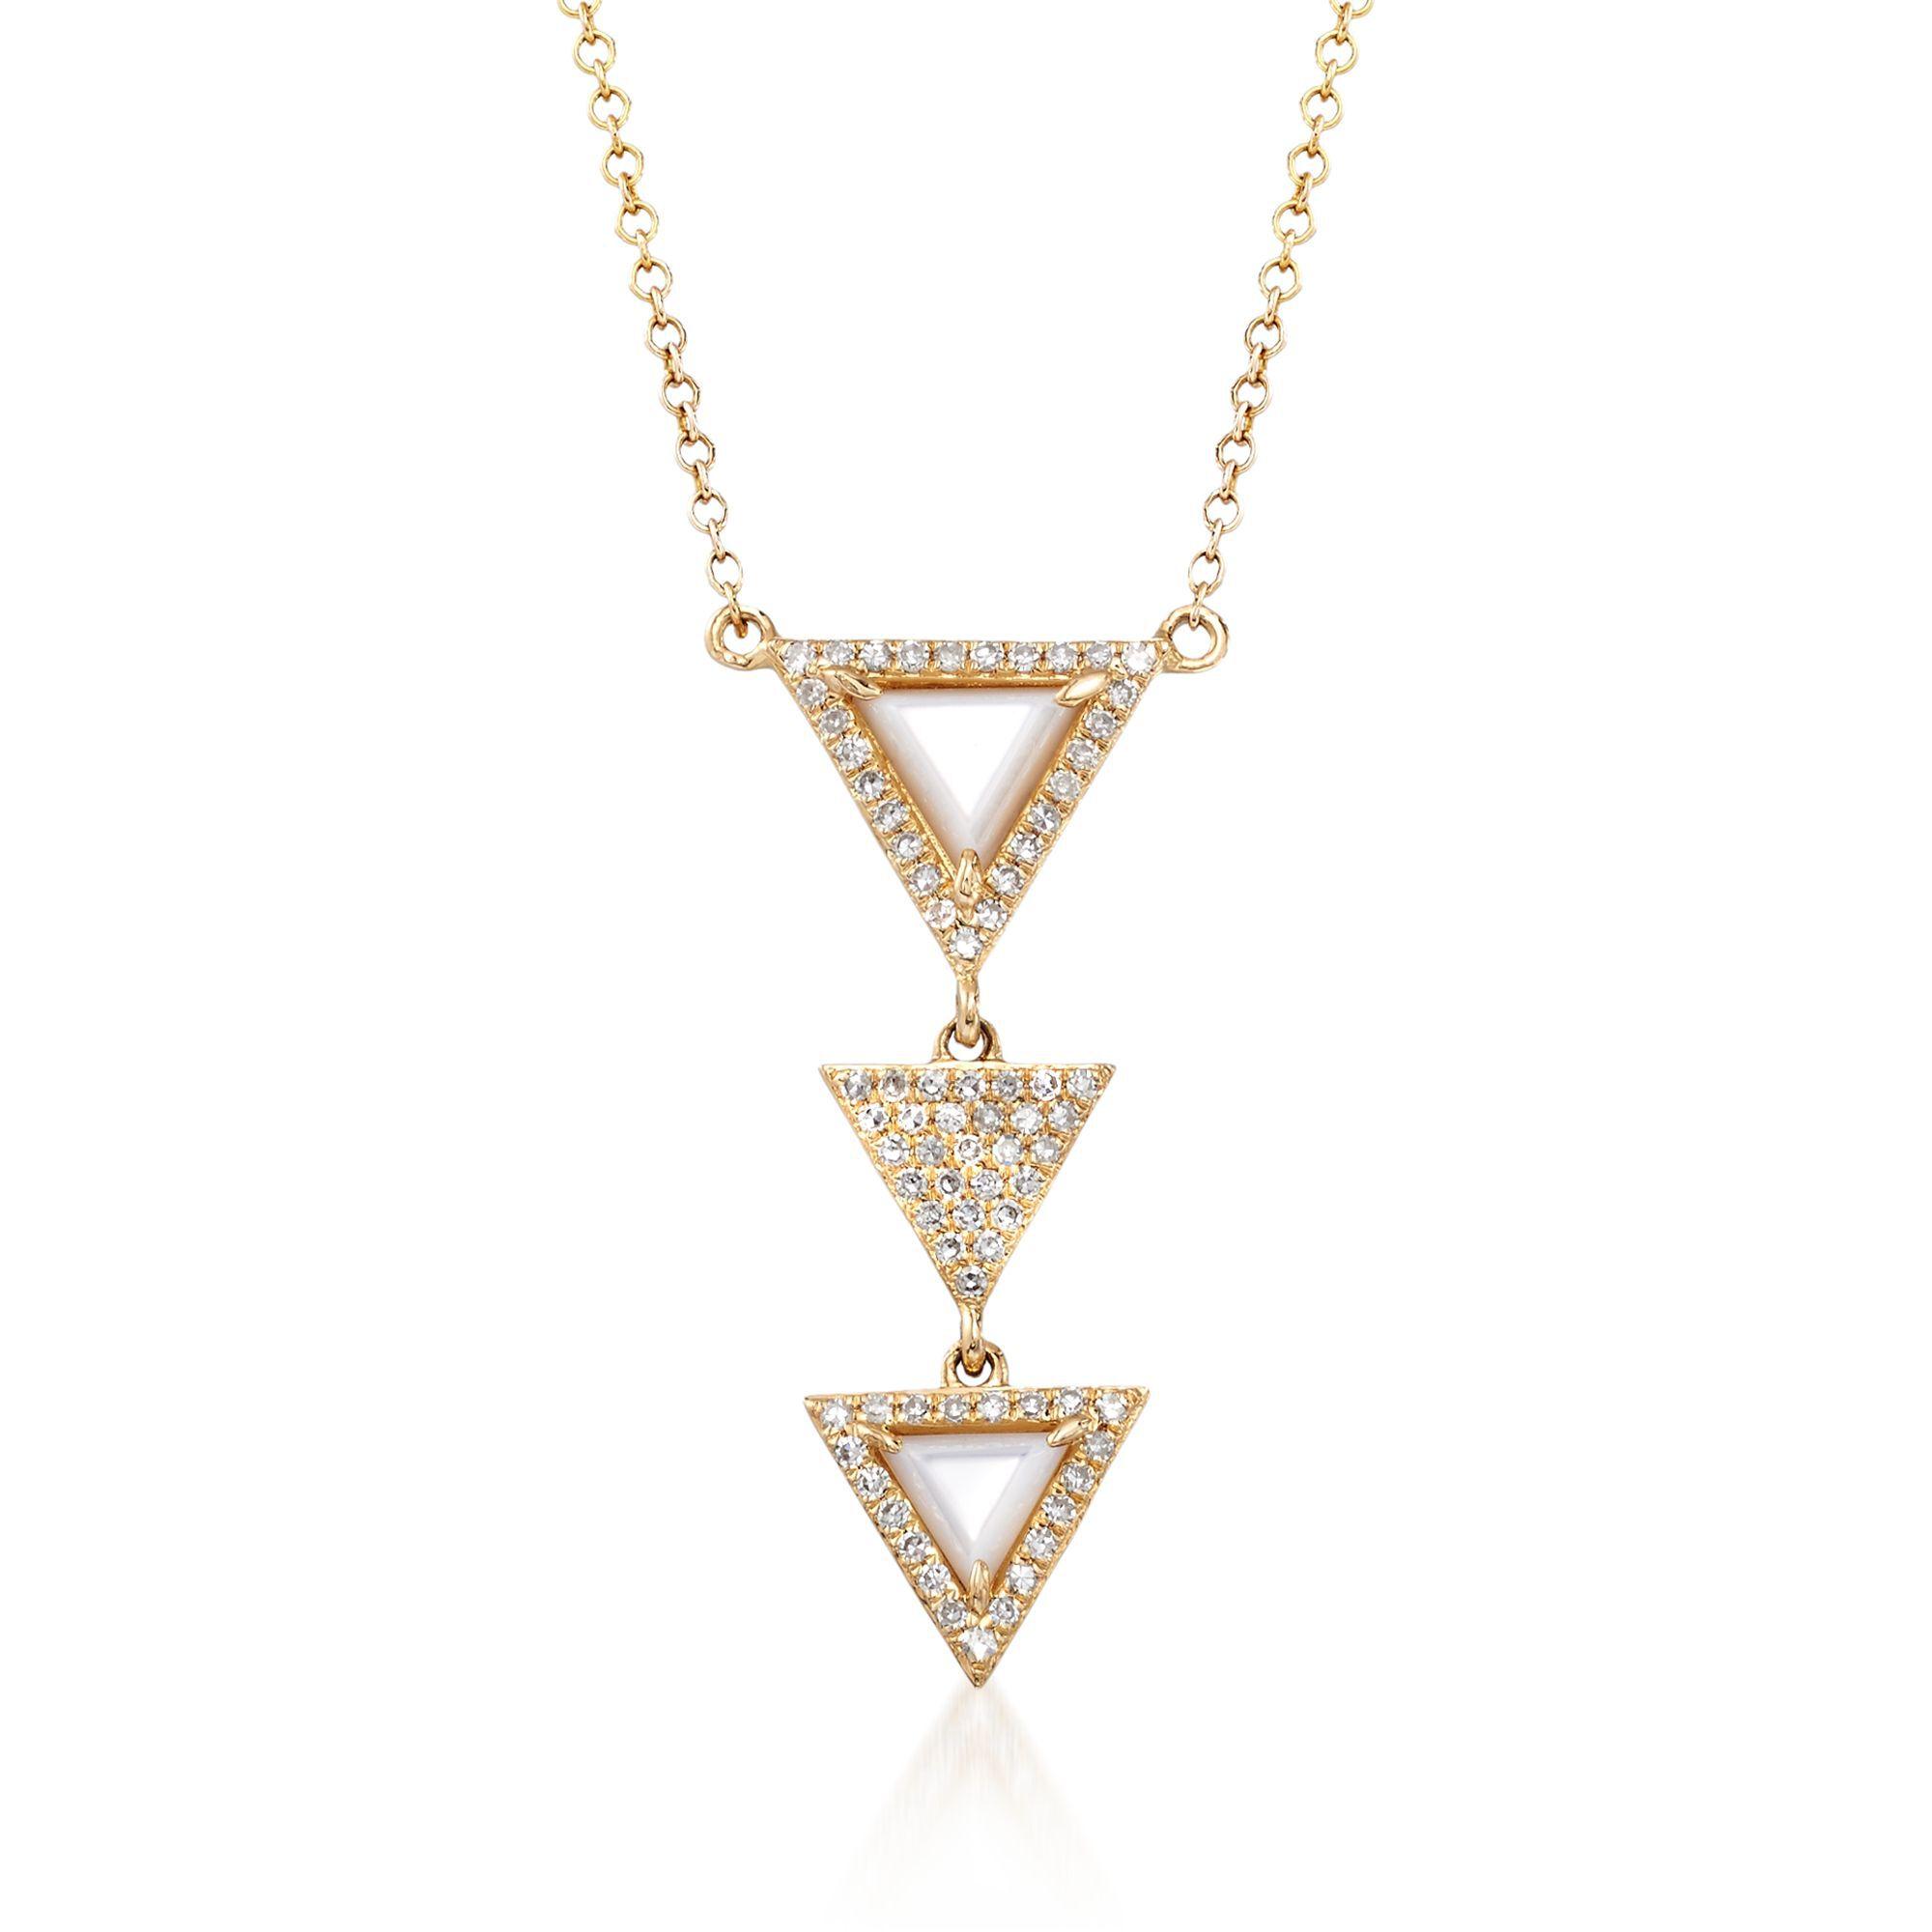 Gold Finished Oval Shape Pendant Chain Tassel Drop Necklace /& Earrings Set